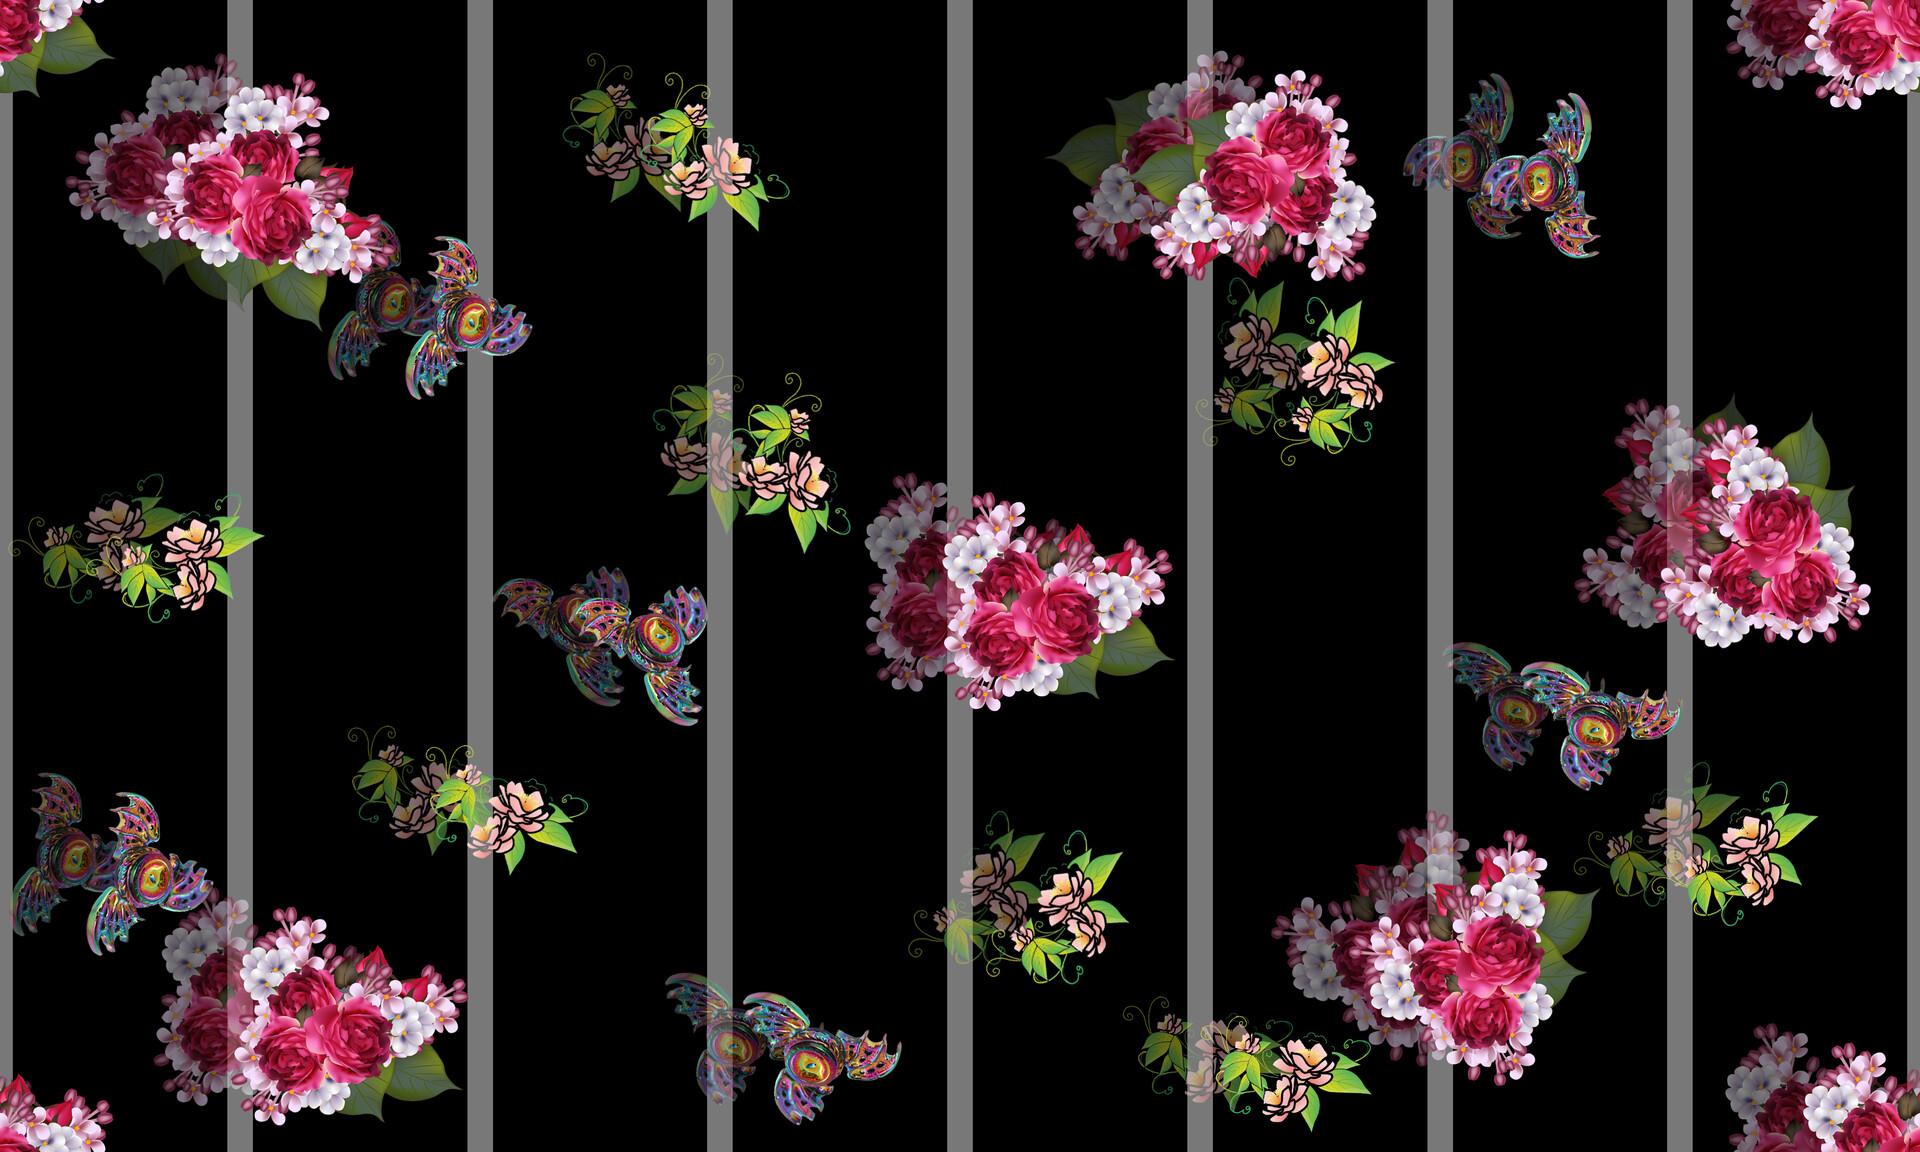 eon the art studio eon the art studio seamless pattern small wild blue flowers on a black background